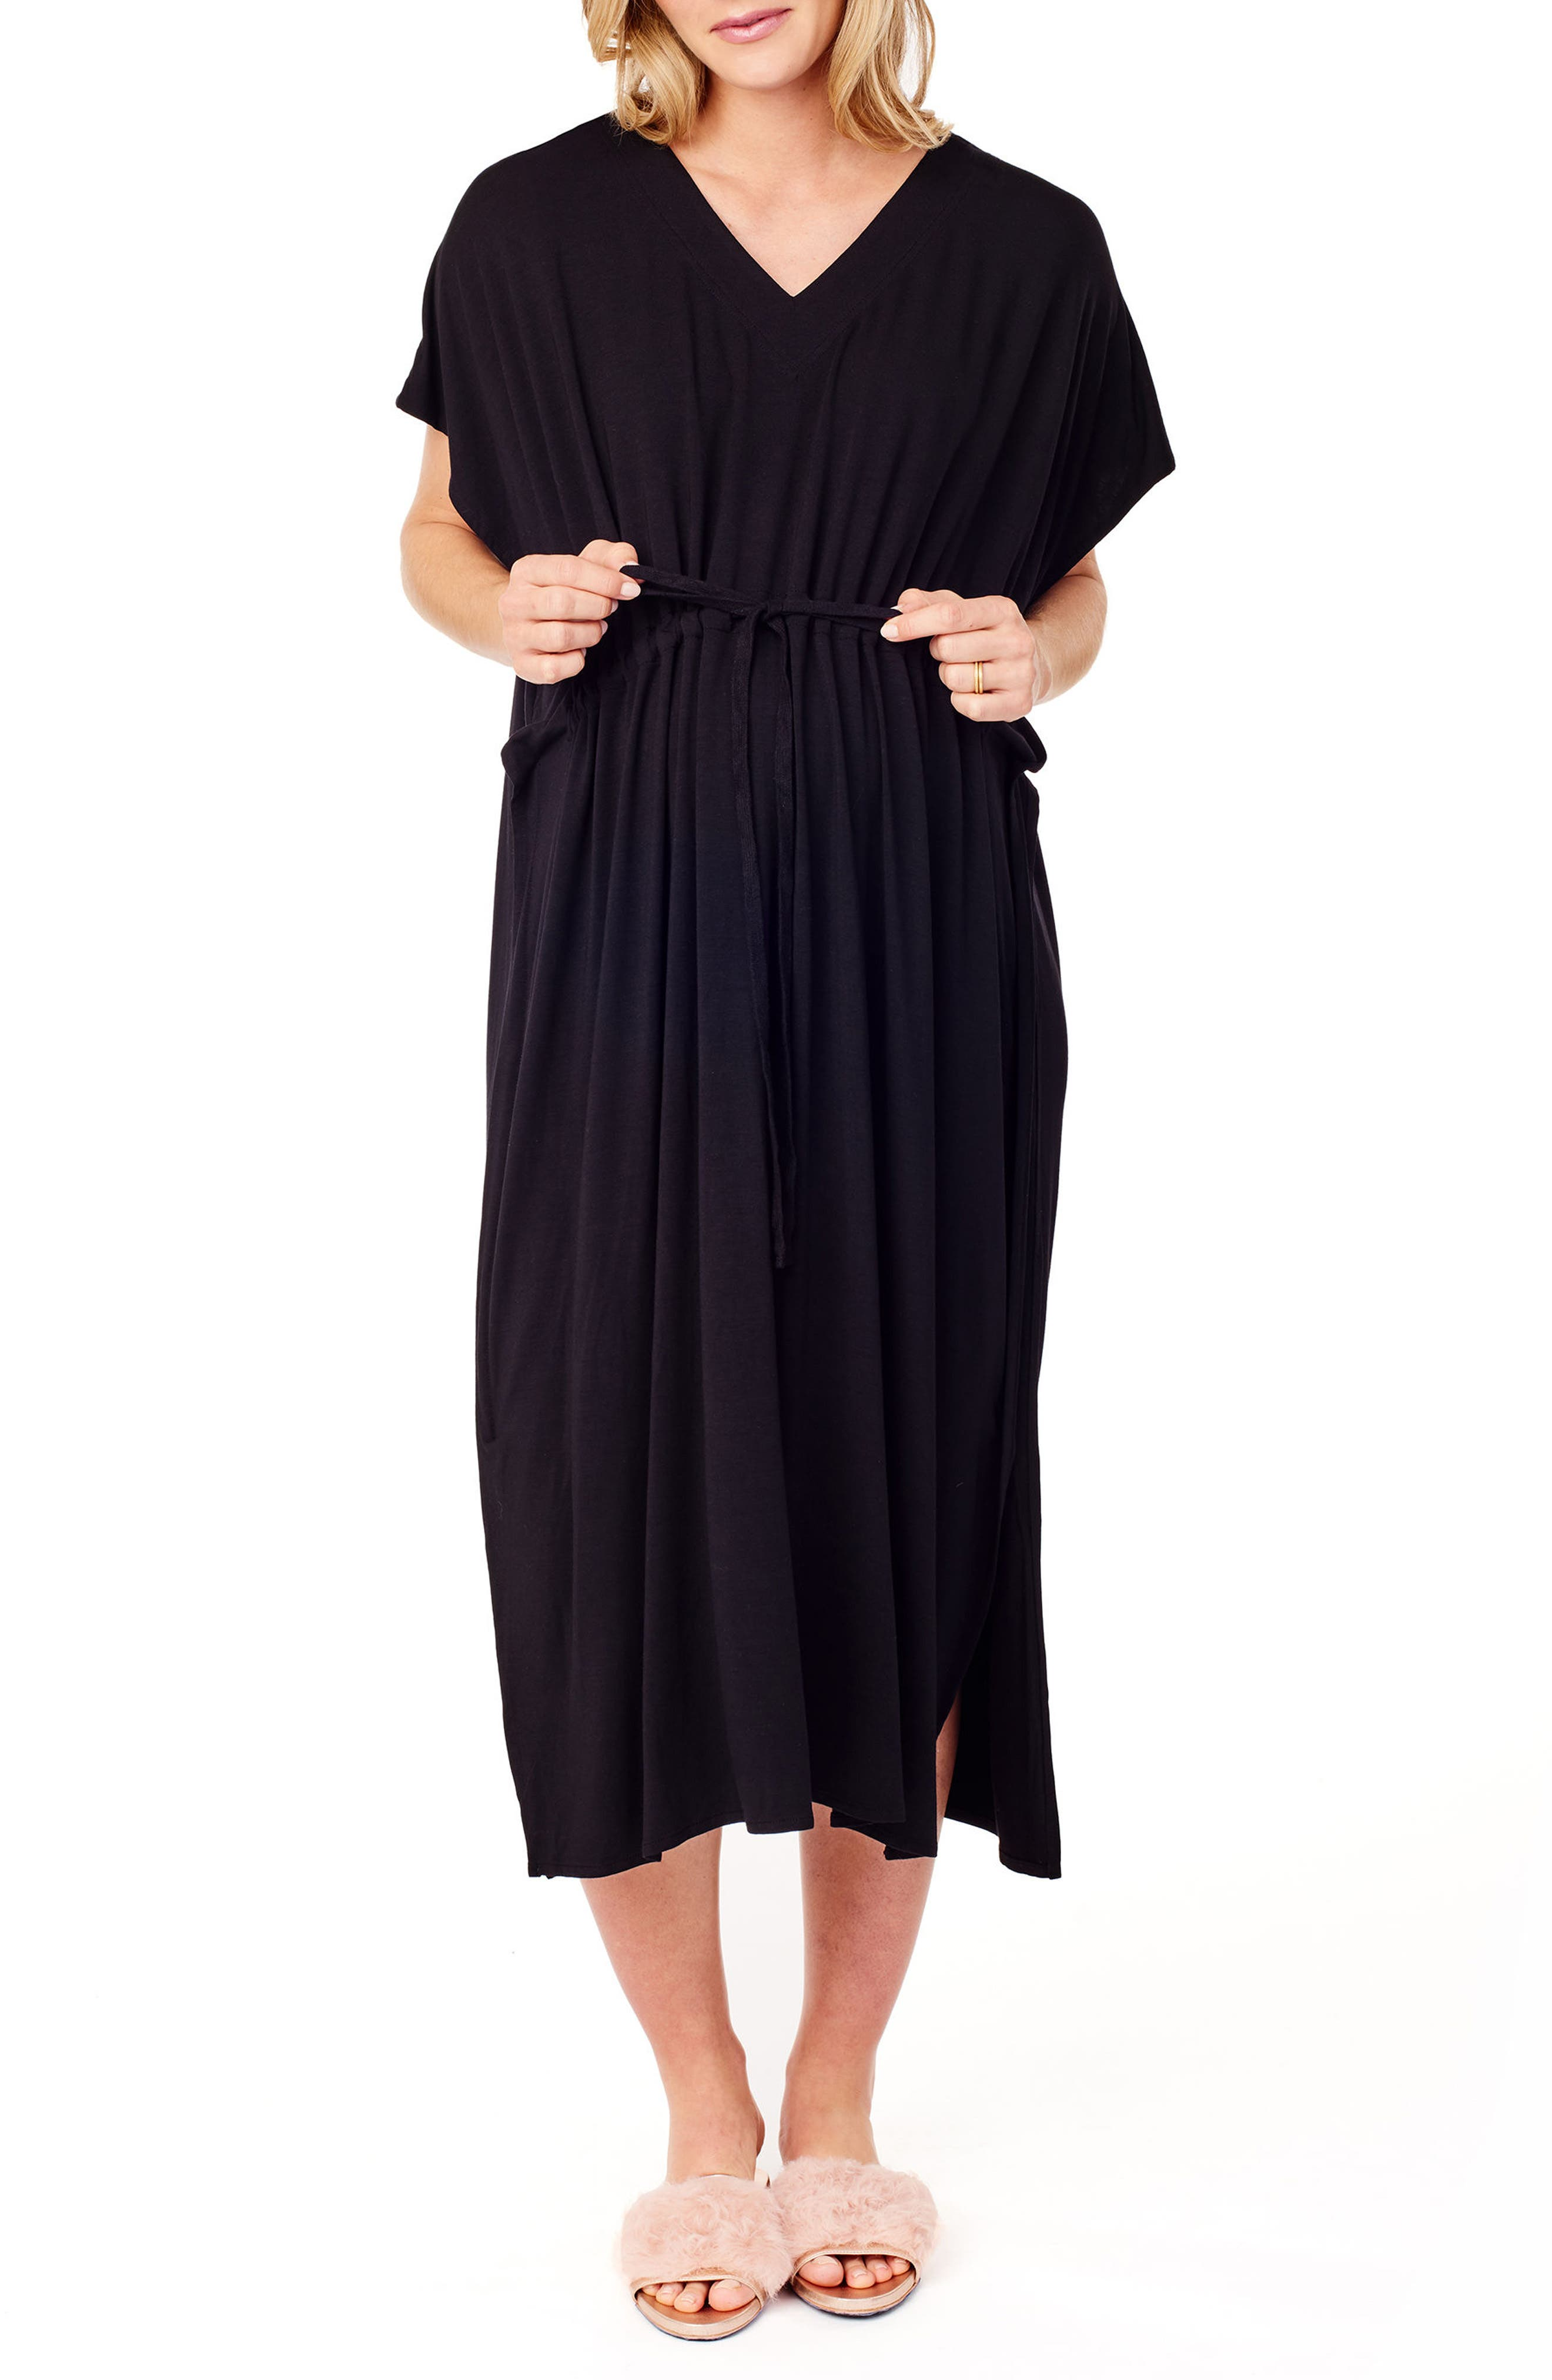 x James Fox & Co. Maternity/Nursing Hospital Gown,                         Main,                         color, Jet Black